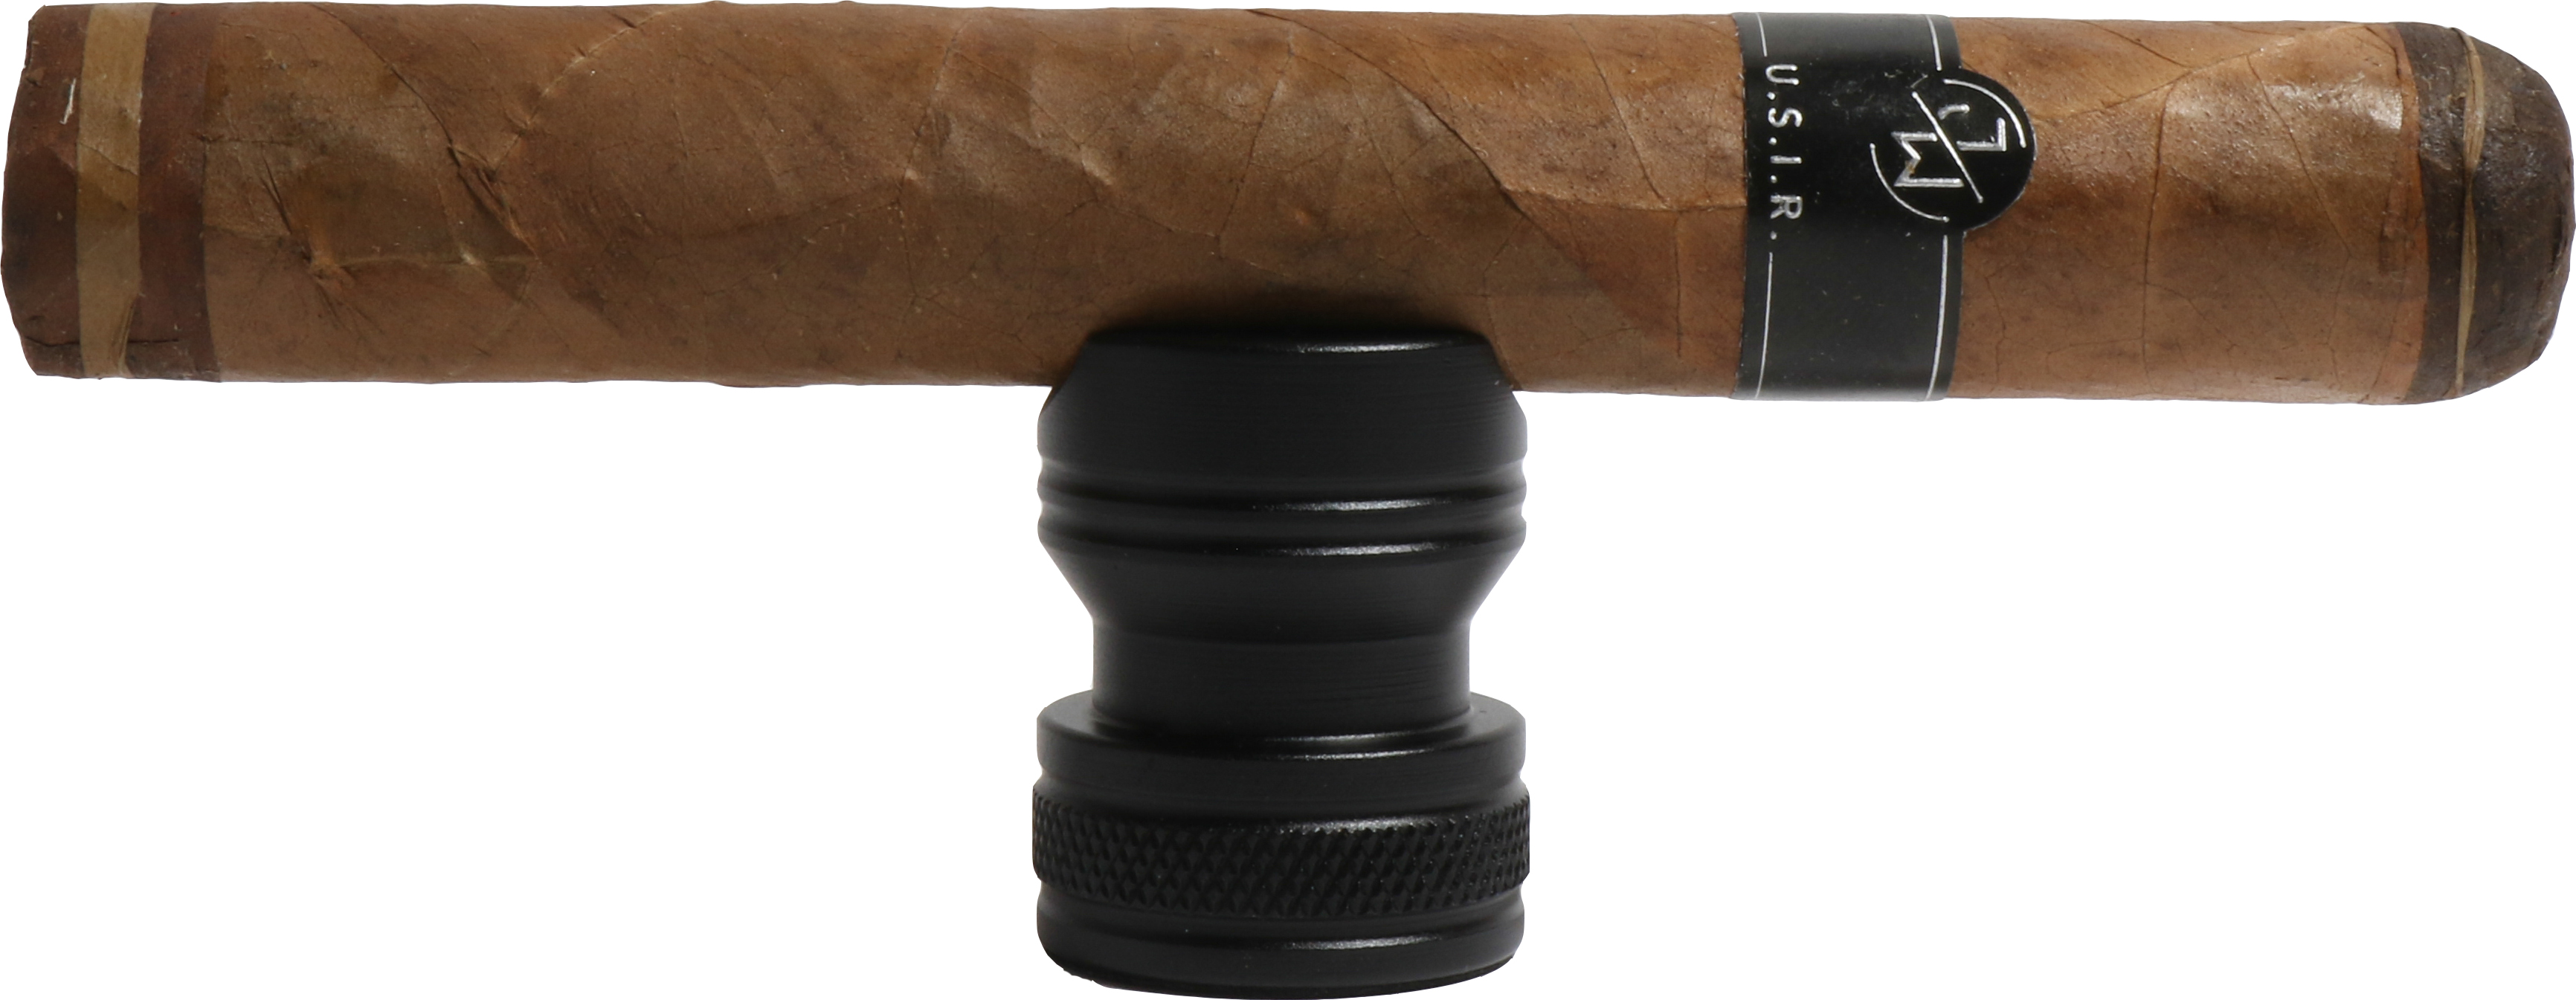 Jake Wyatt Cigar Co. - Cigar Stand